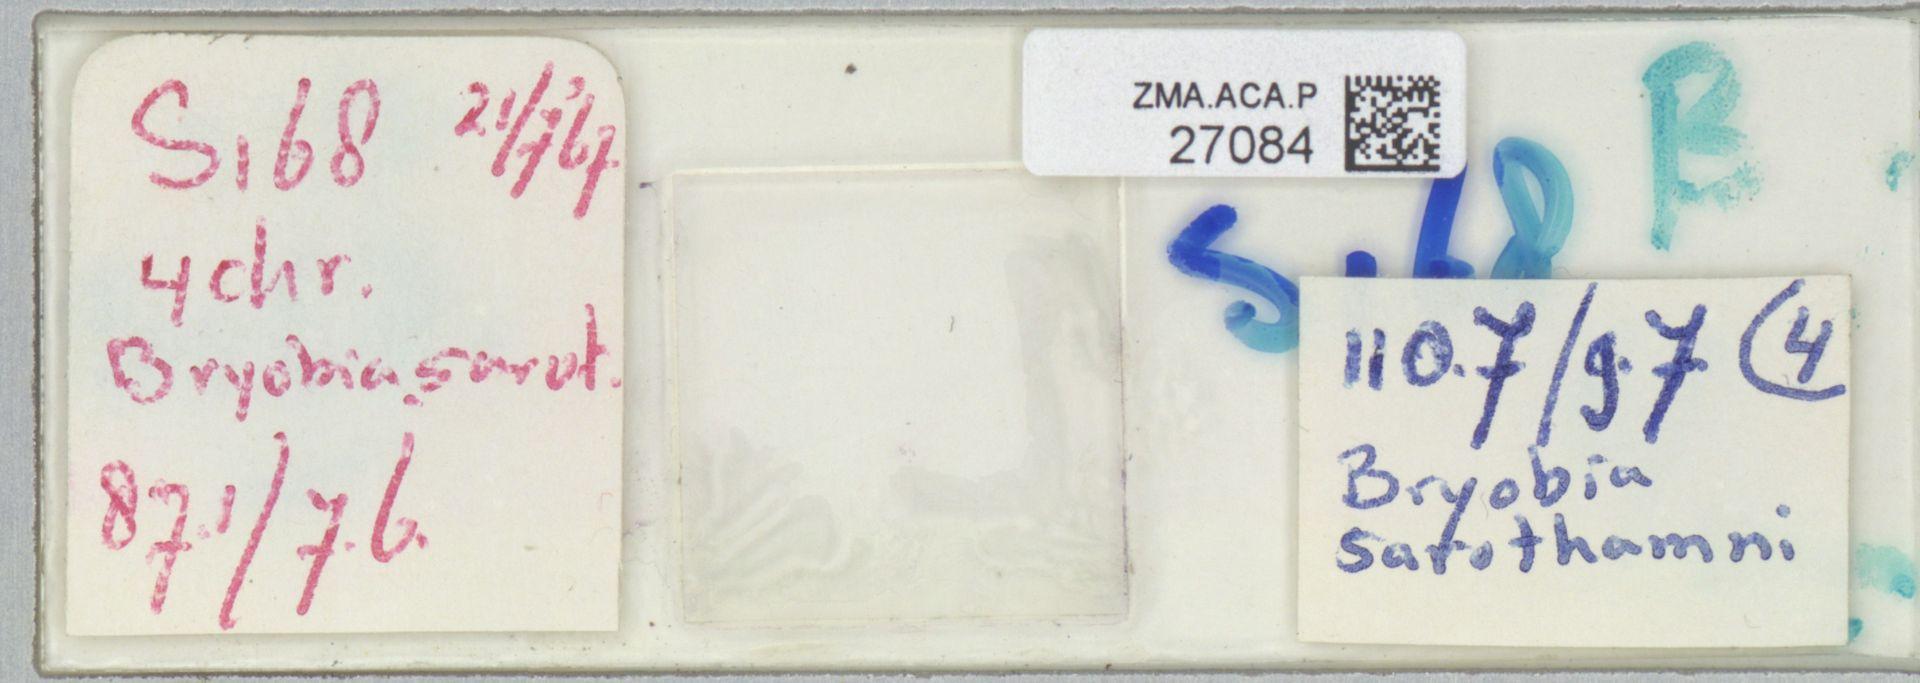 ZMA.ACA.P.27084 | Bryobia sarothamni